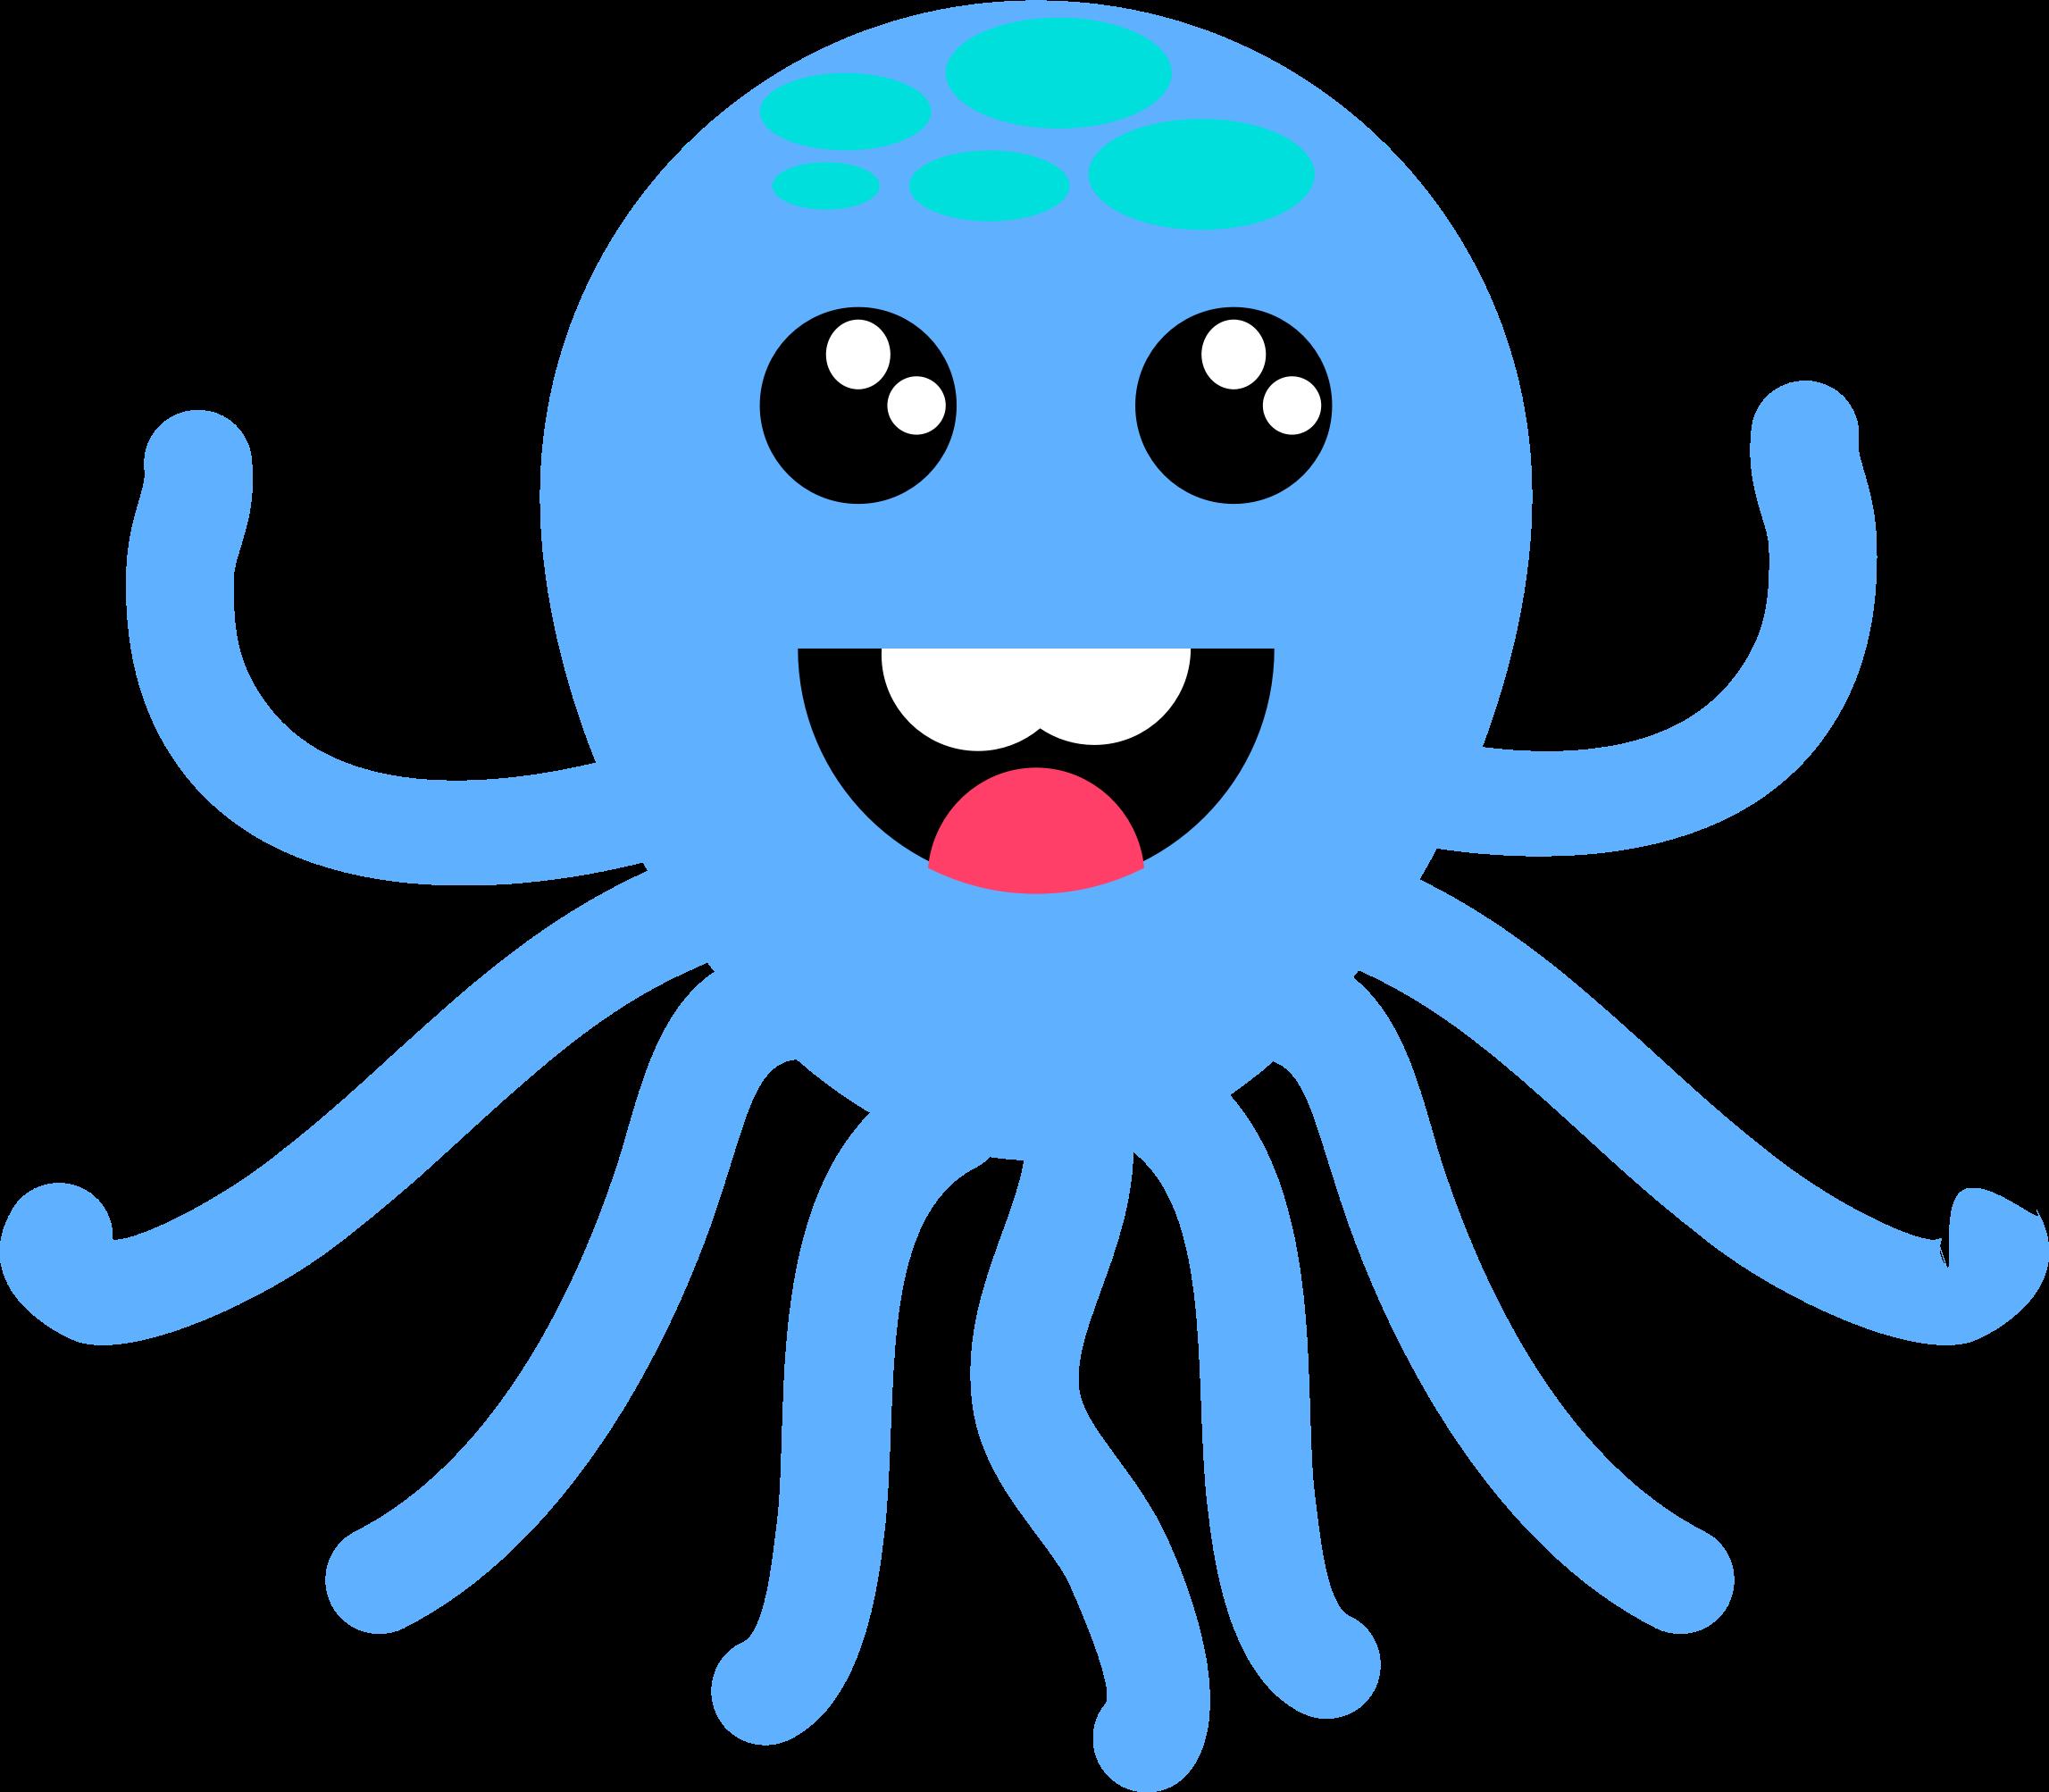 Octopus 2015090112